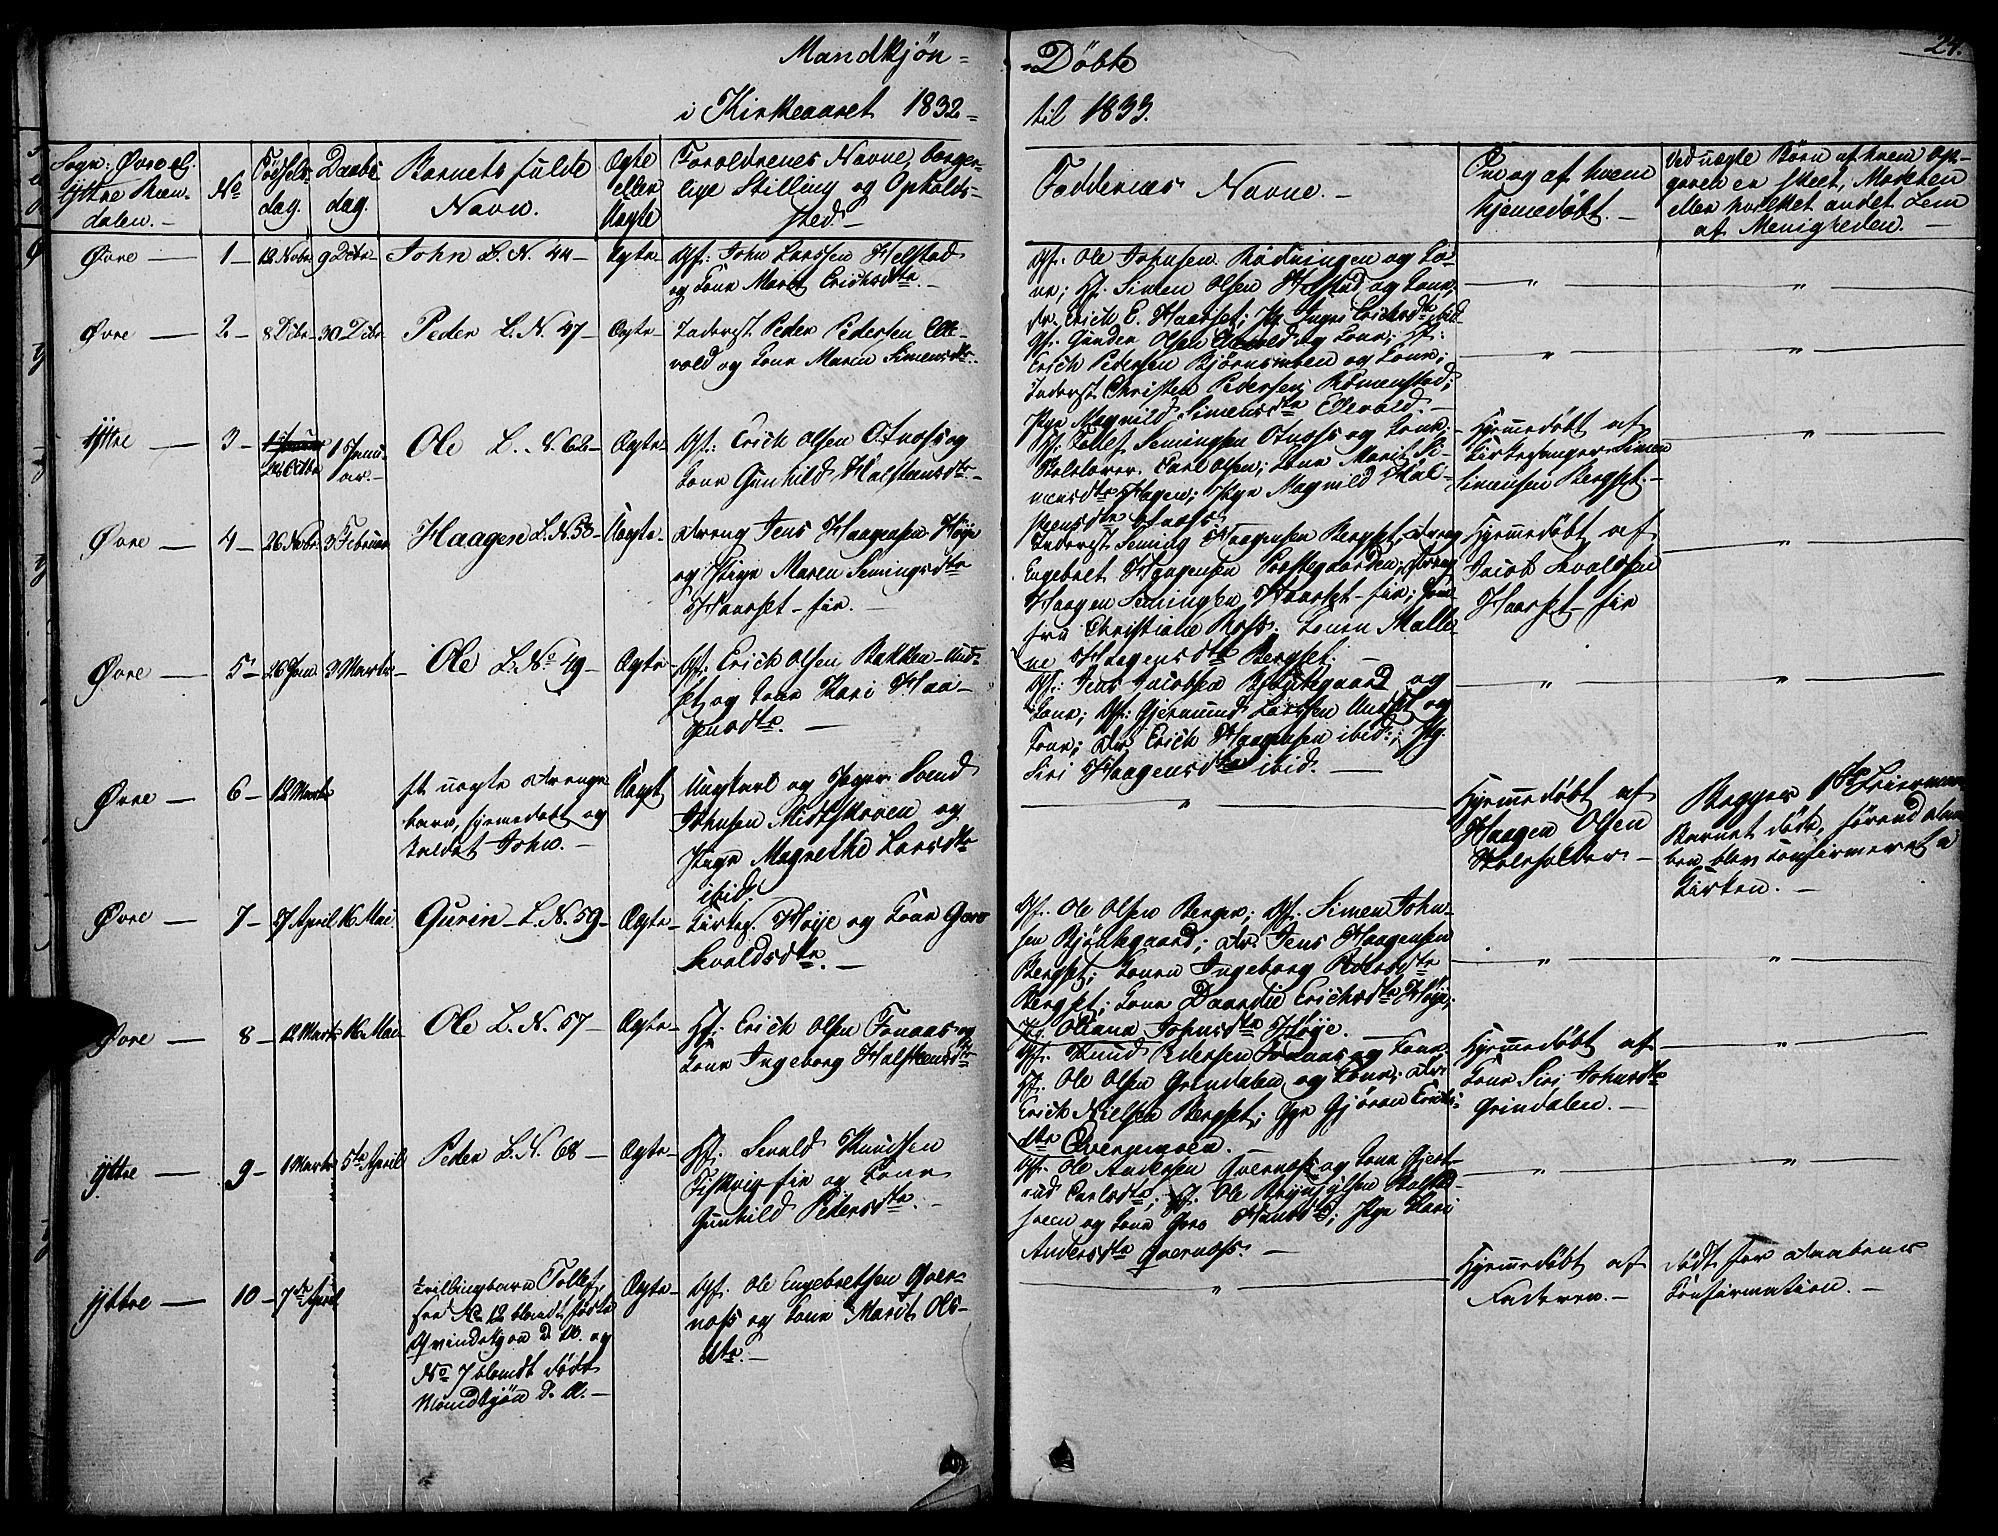 SAH, Rendalen prestekontor, H/Ha/Haa/L0004: Ministerialbok nr. 4, 1829-1852, s. 24